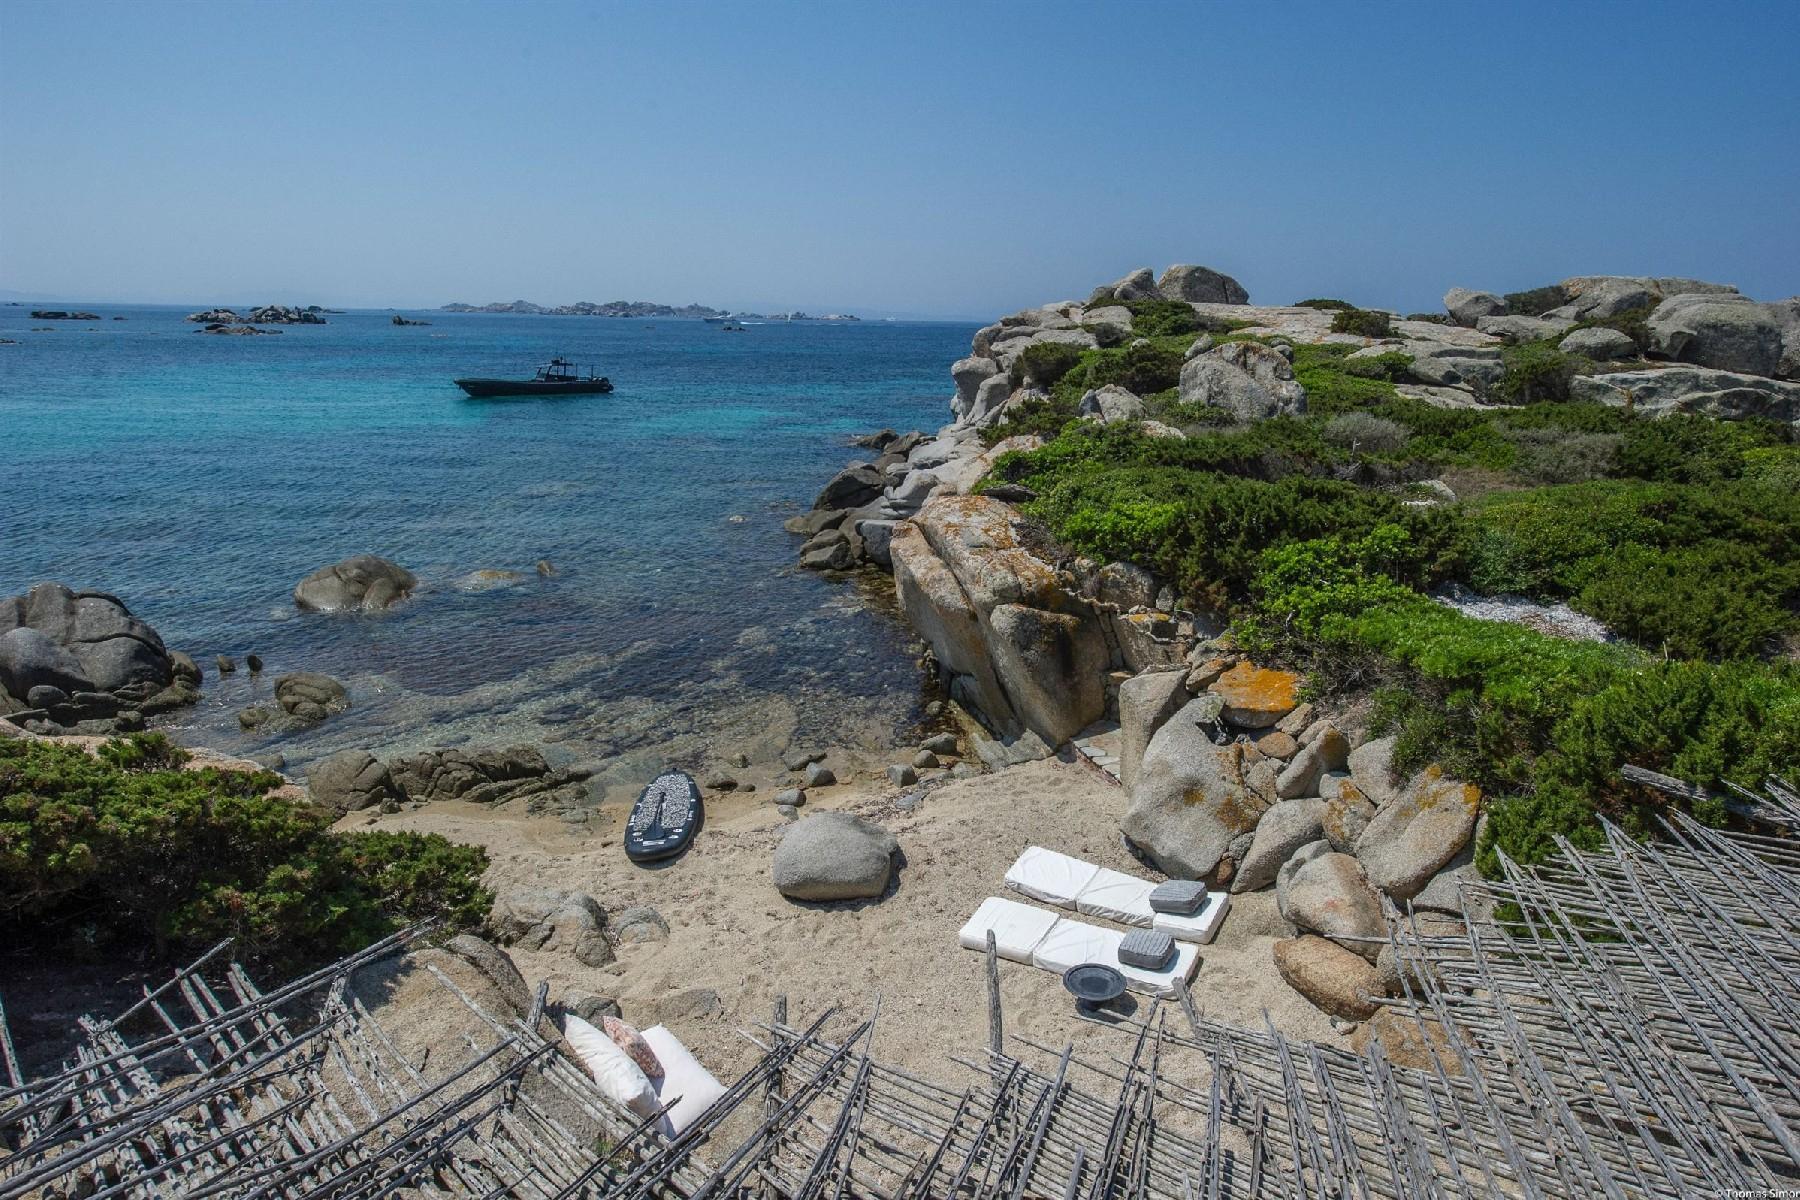 Iconica villa pieds dans l'eau all'ile de Cavallo - 10